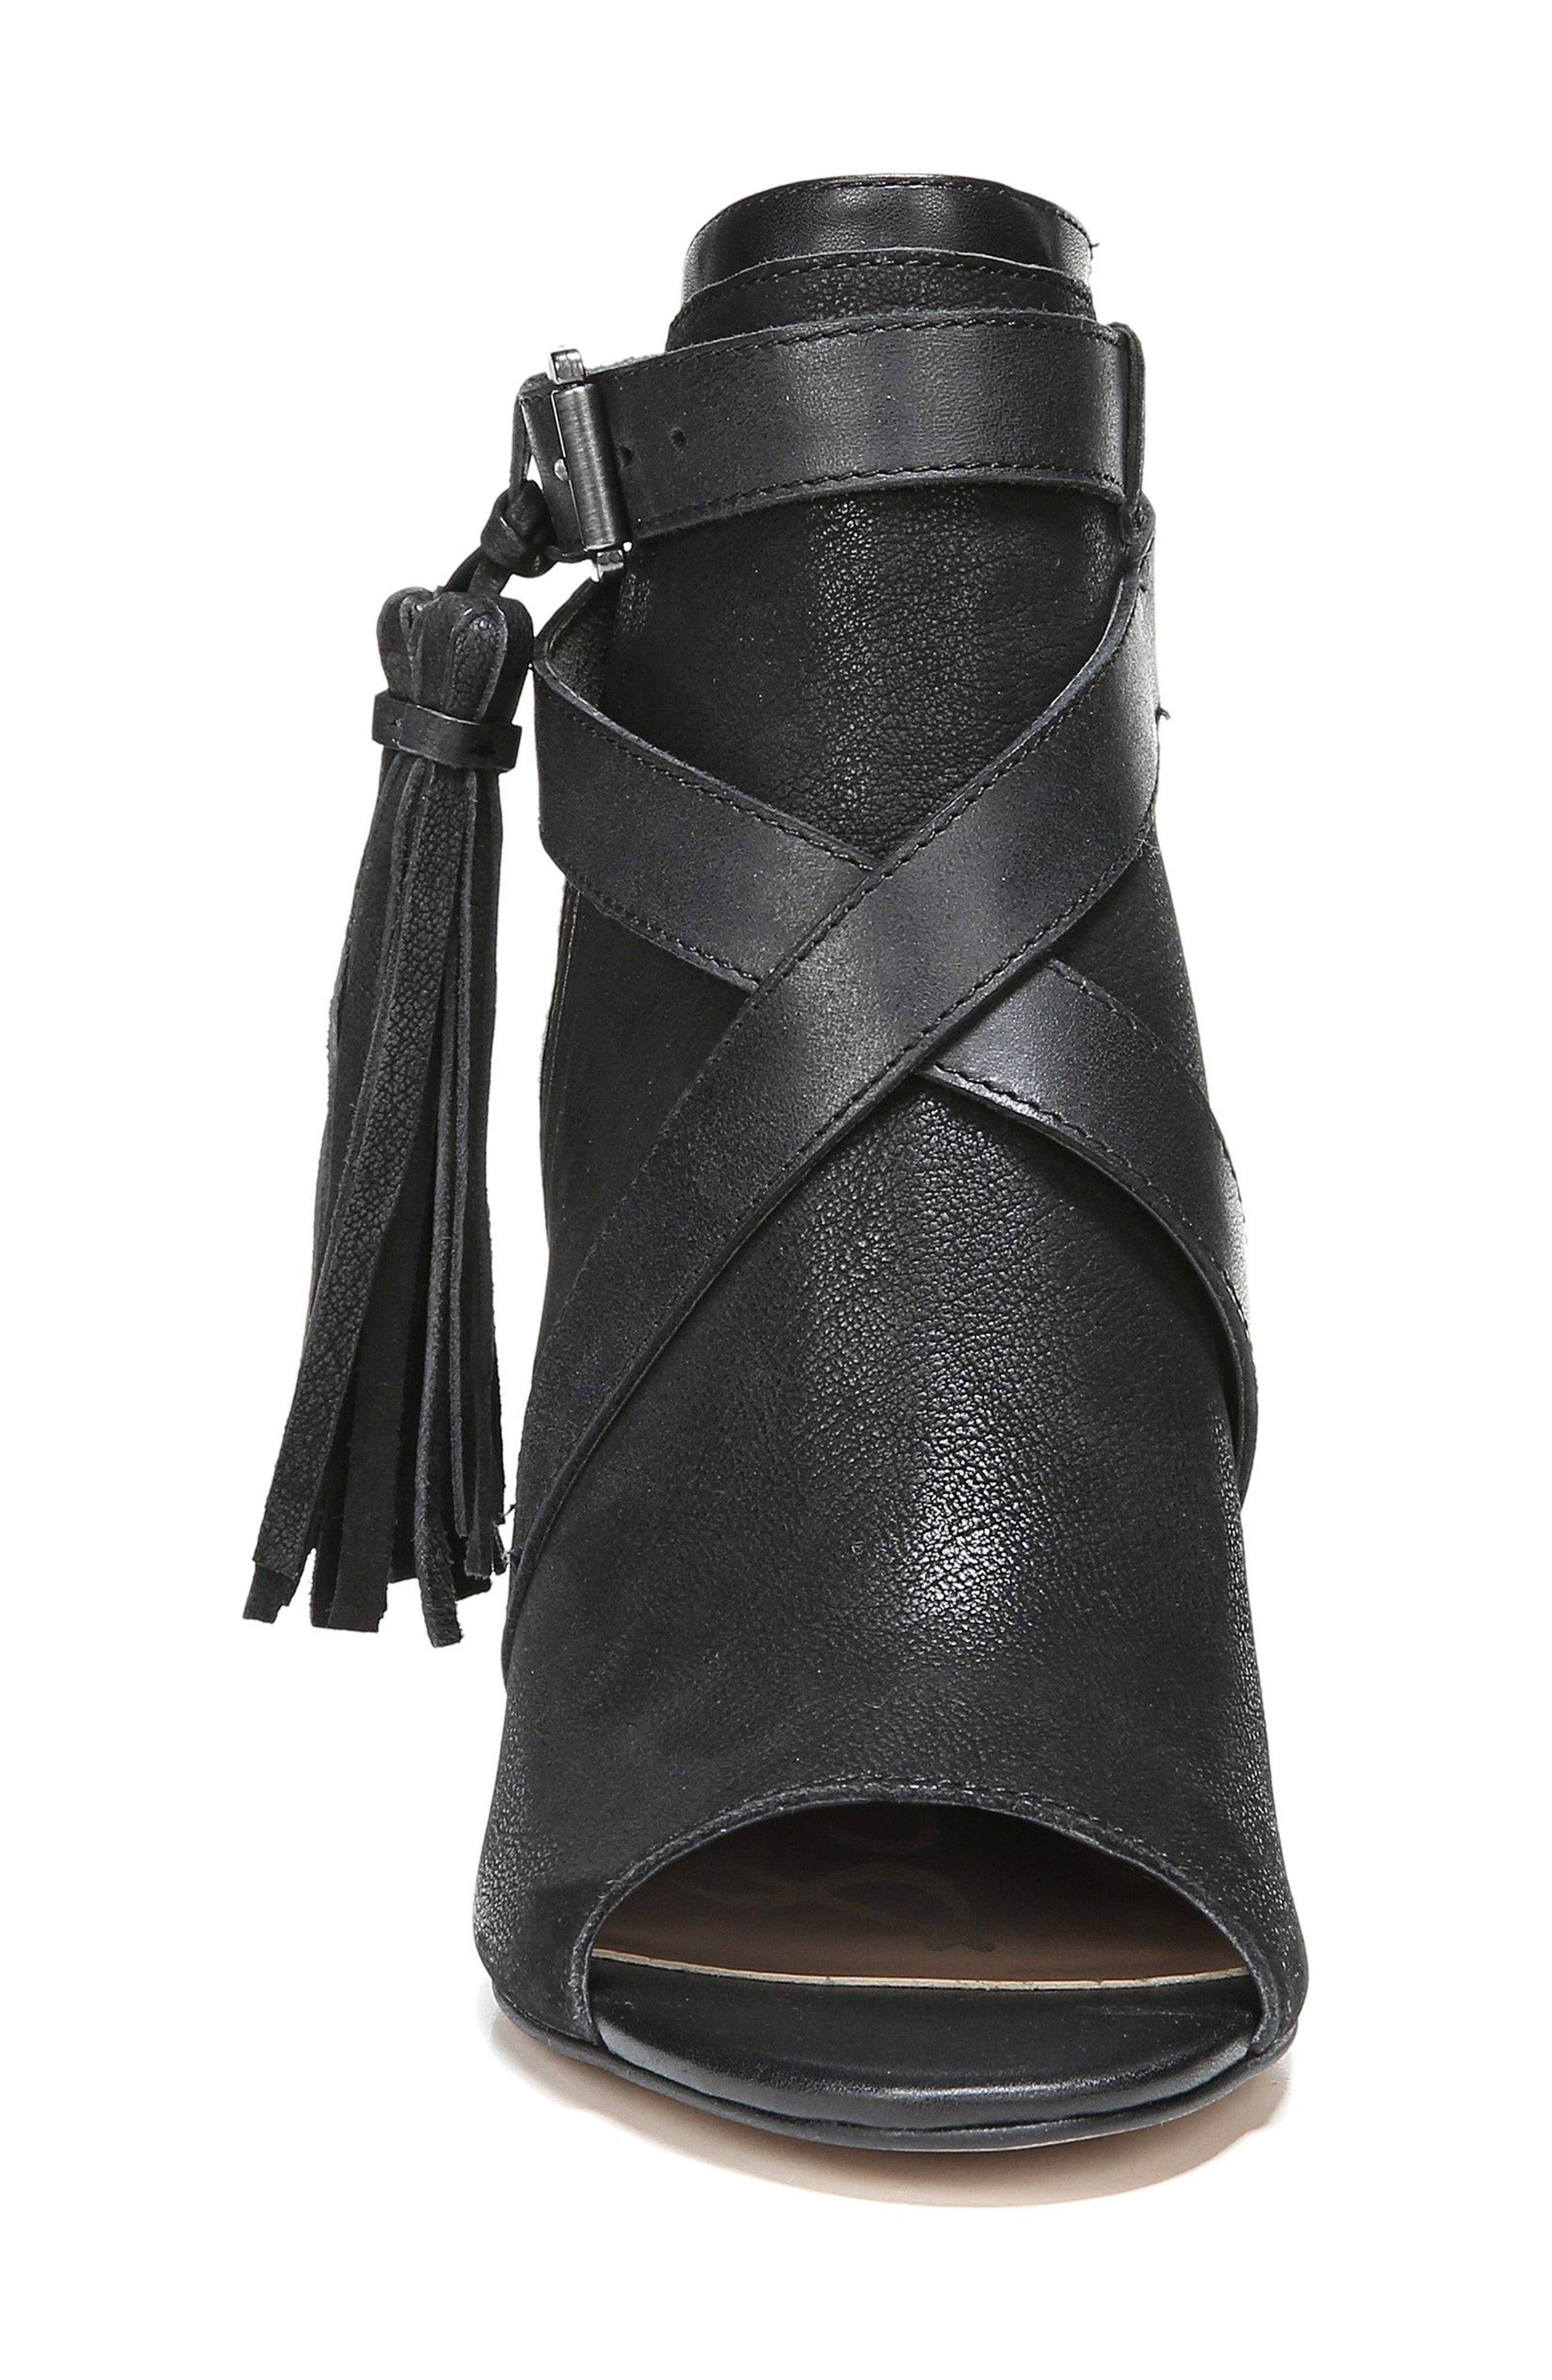 Vermont Block Heel Sandal,                             Alternate thumbnail 4, color,                             001